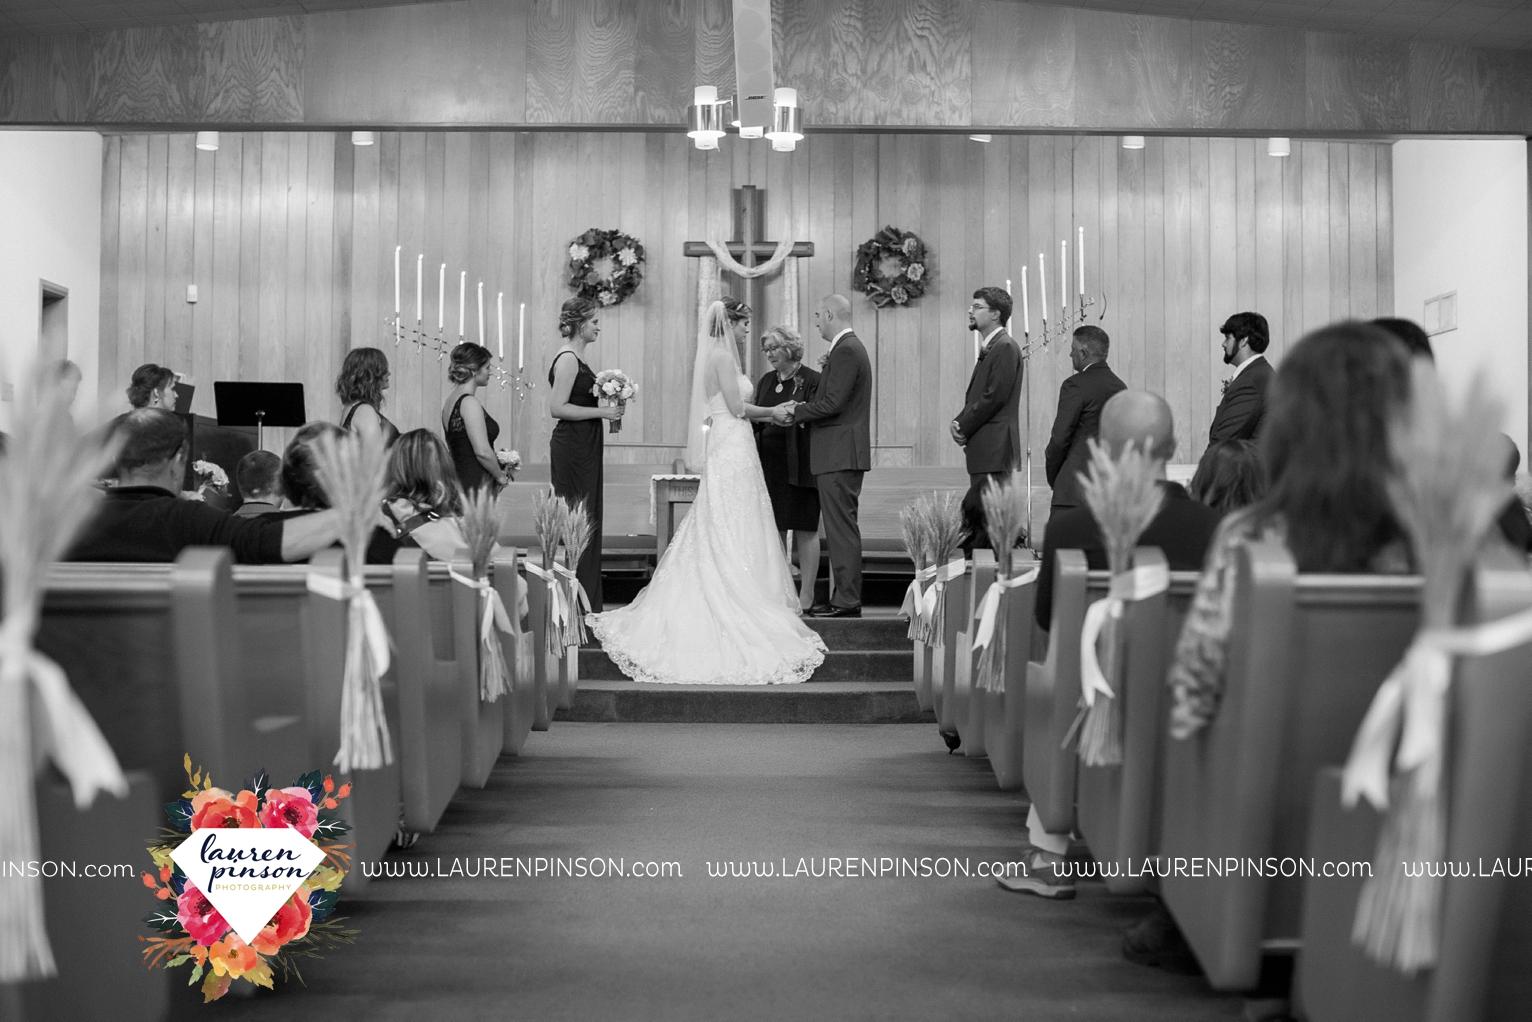 kemp-center-for-the-arts-wichita-falls-texas-wedding-photographer-fall-wedding-pumpkins-158.jpg